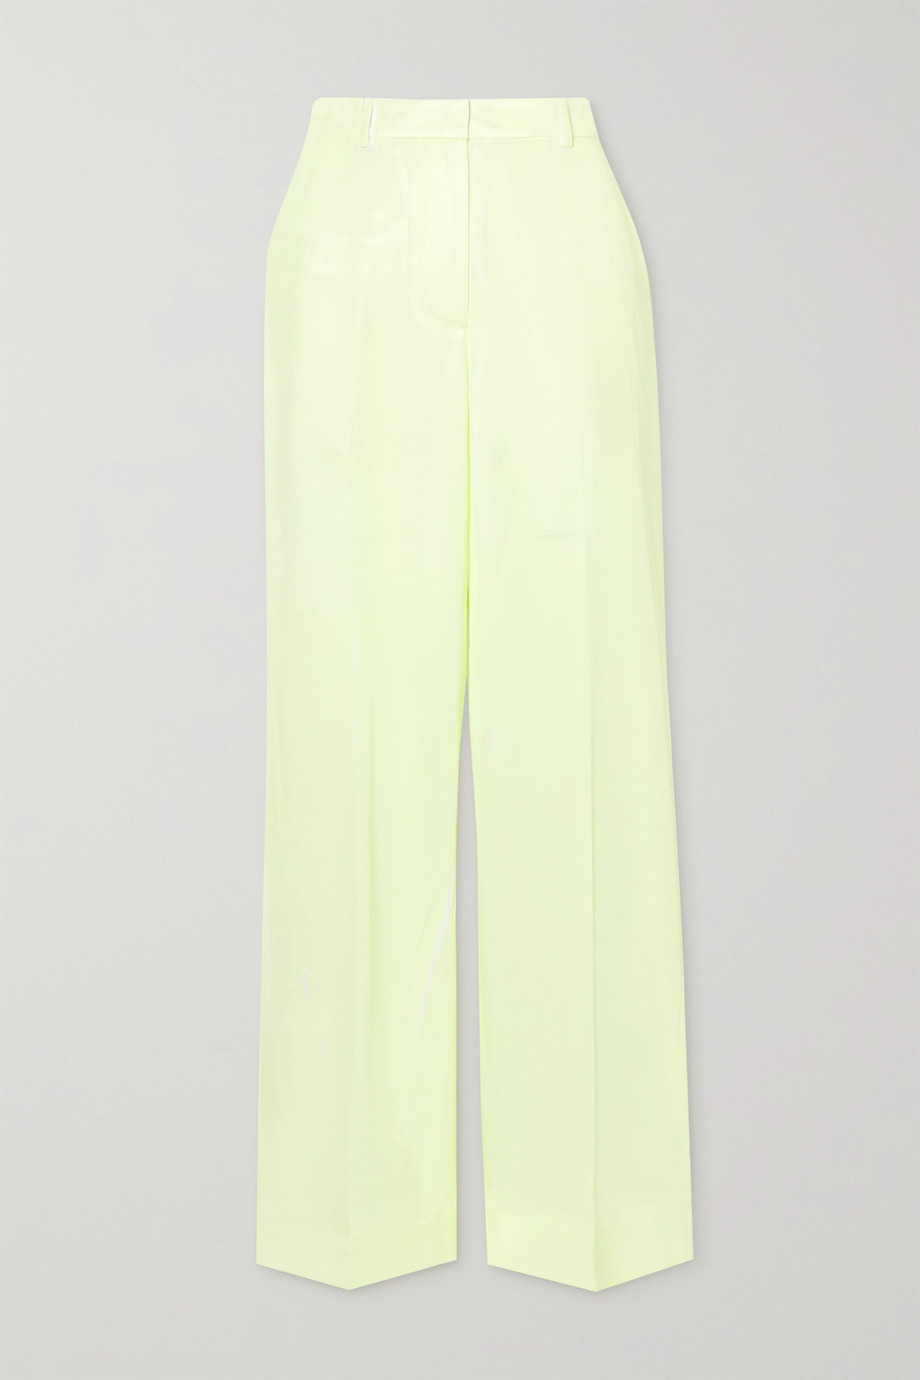 3.1 Phillip Lim 双色斜纹布长裤